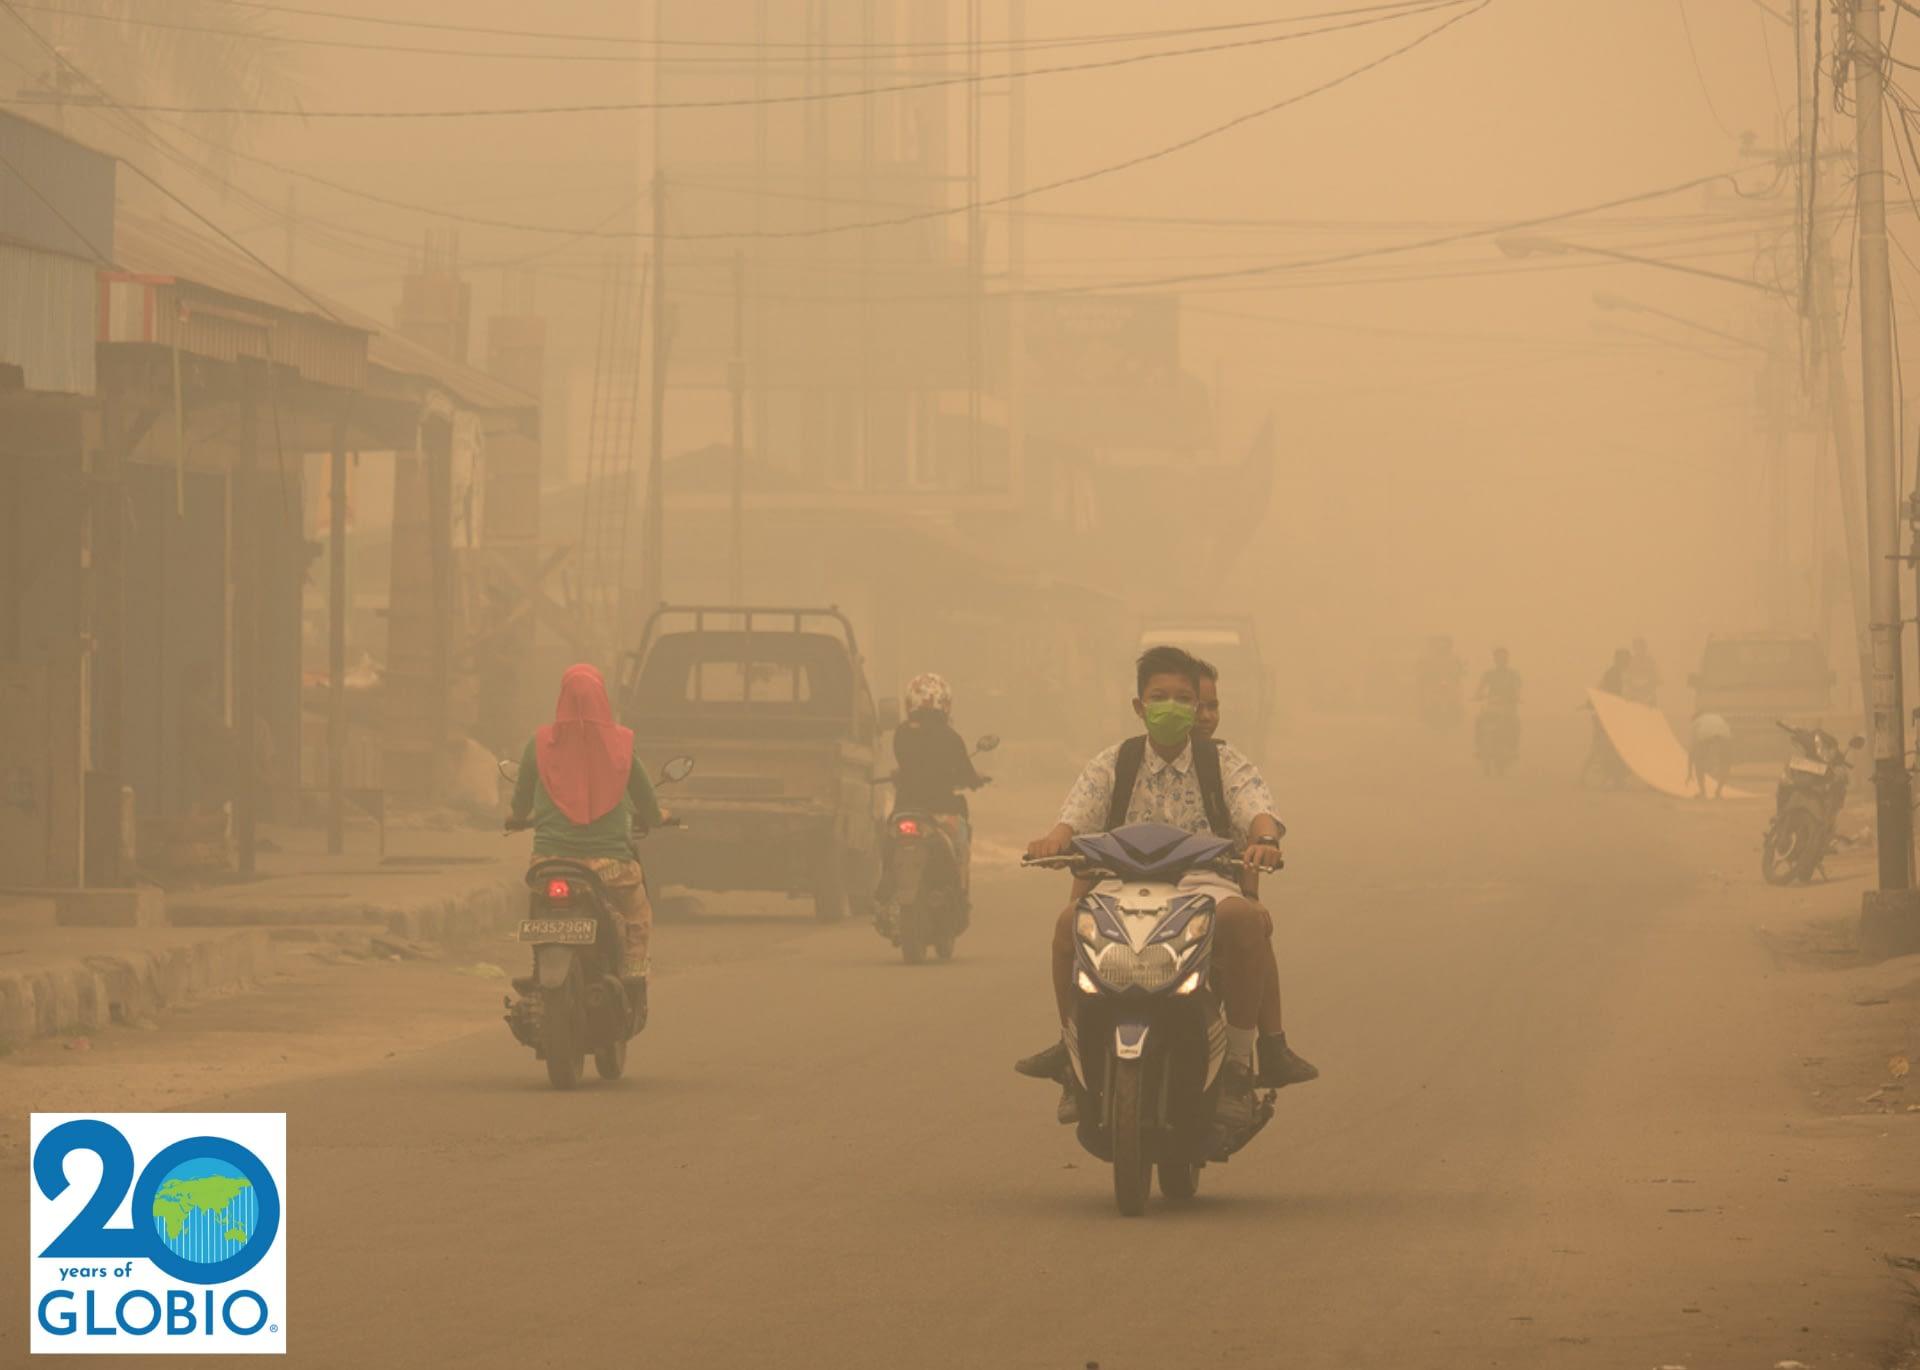 2015 Fires in Borneo